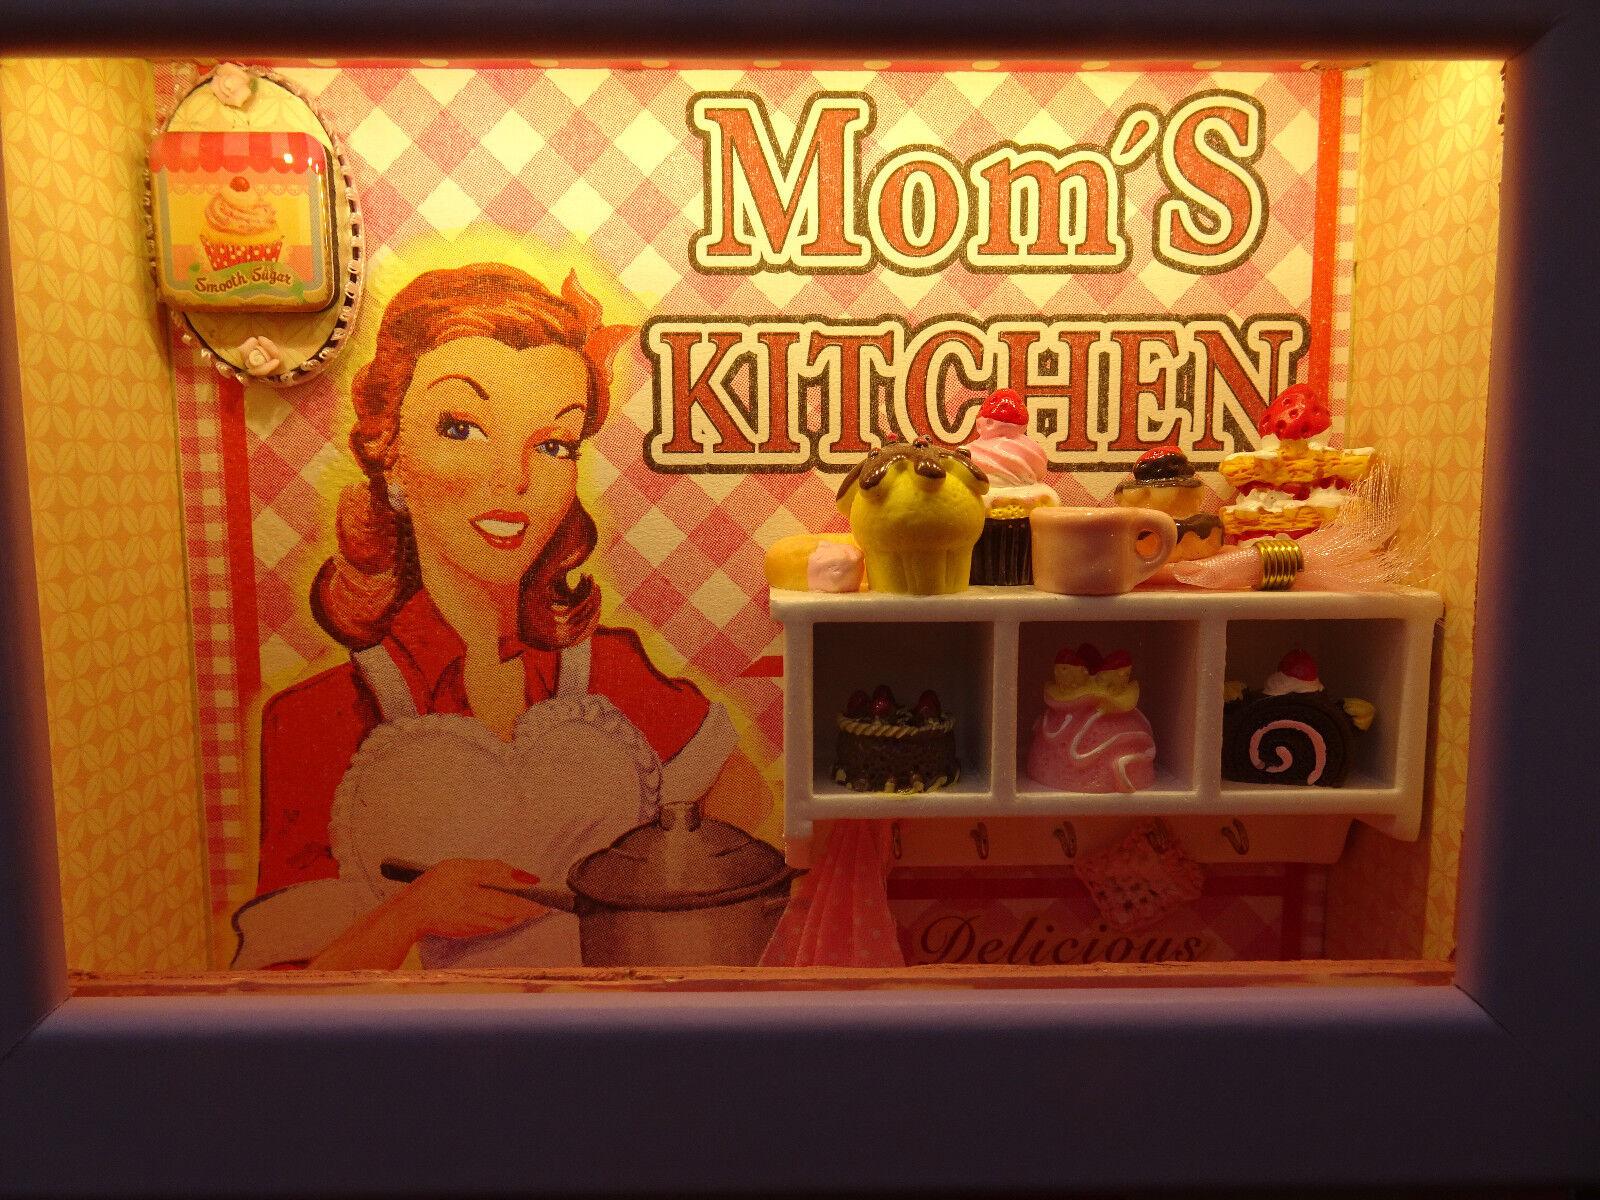 Lightbox Lightbox Lightbox Schaukasten Nachtlicht LED Geschenk Handarbeit Unikat Moms Kitchen | New Products  |  7fa9f7